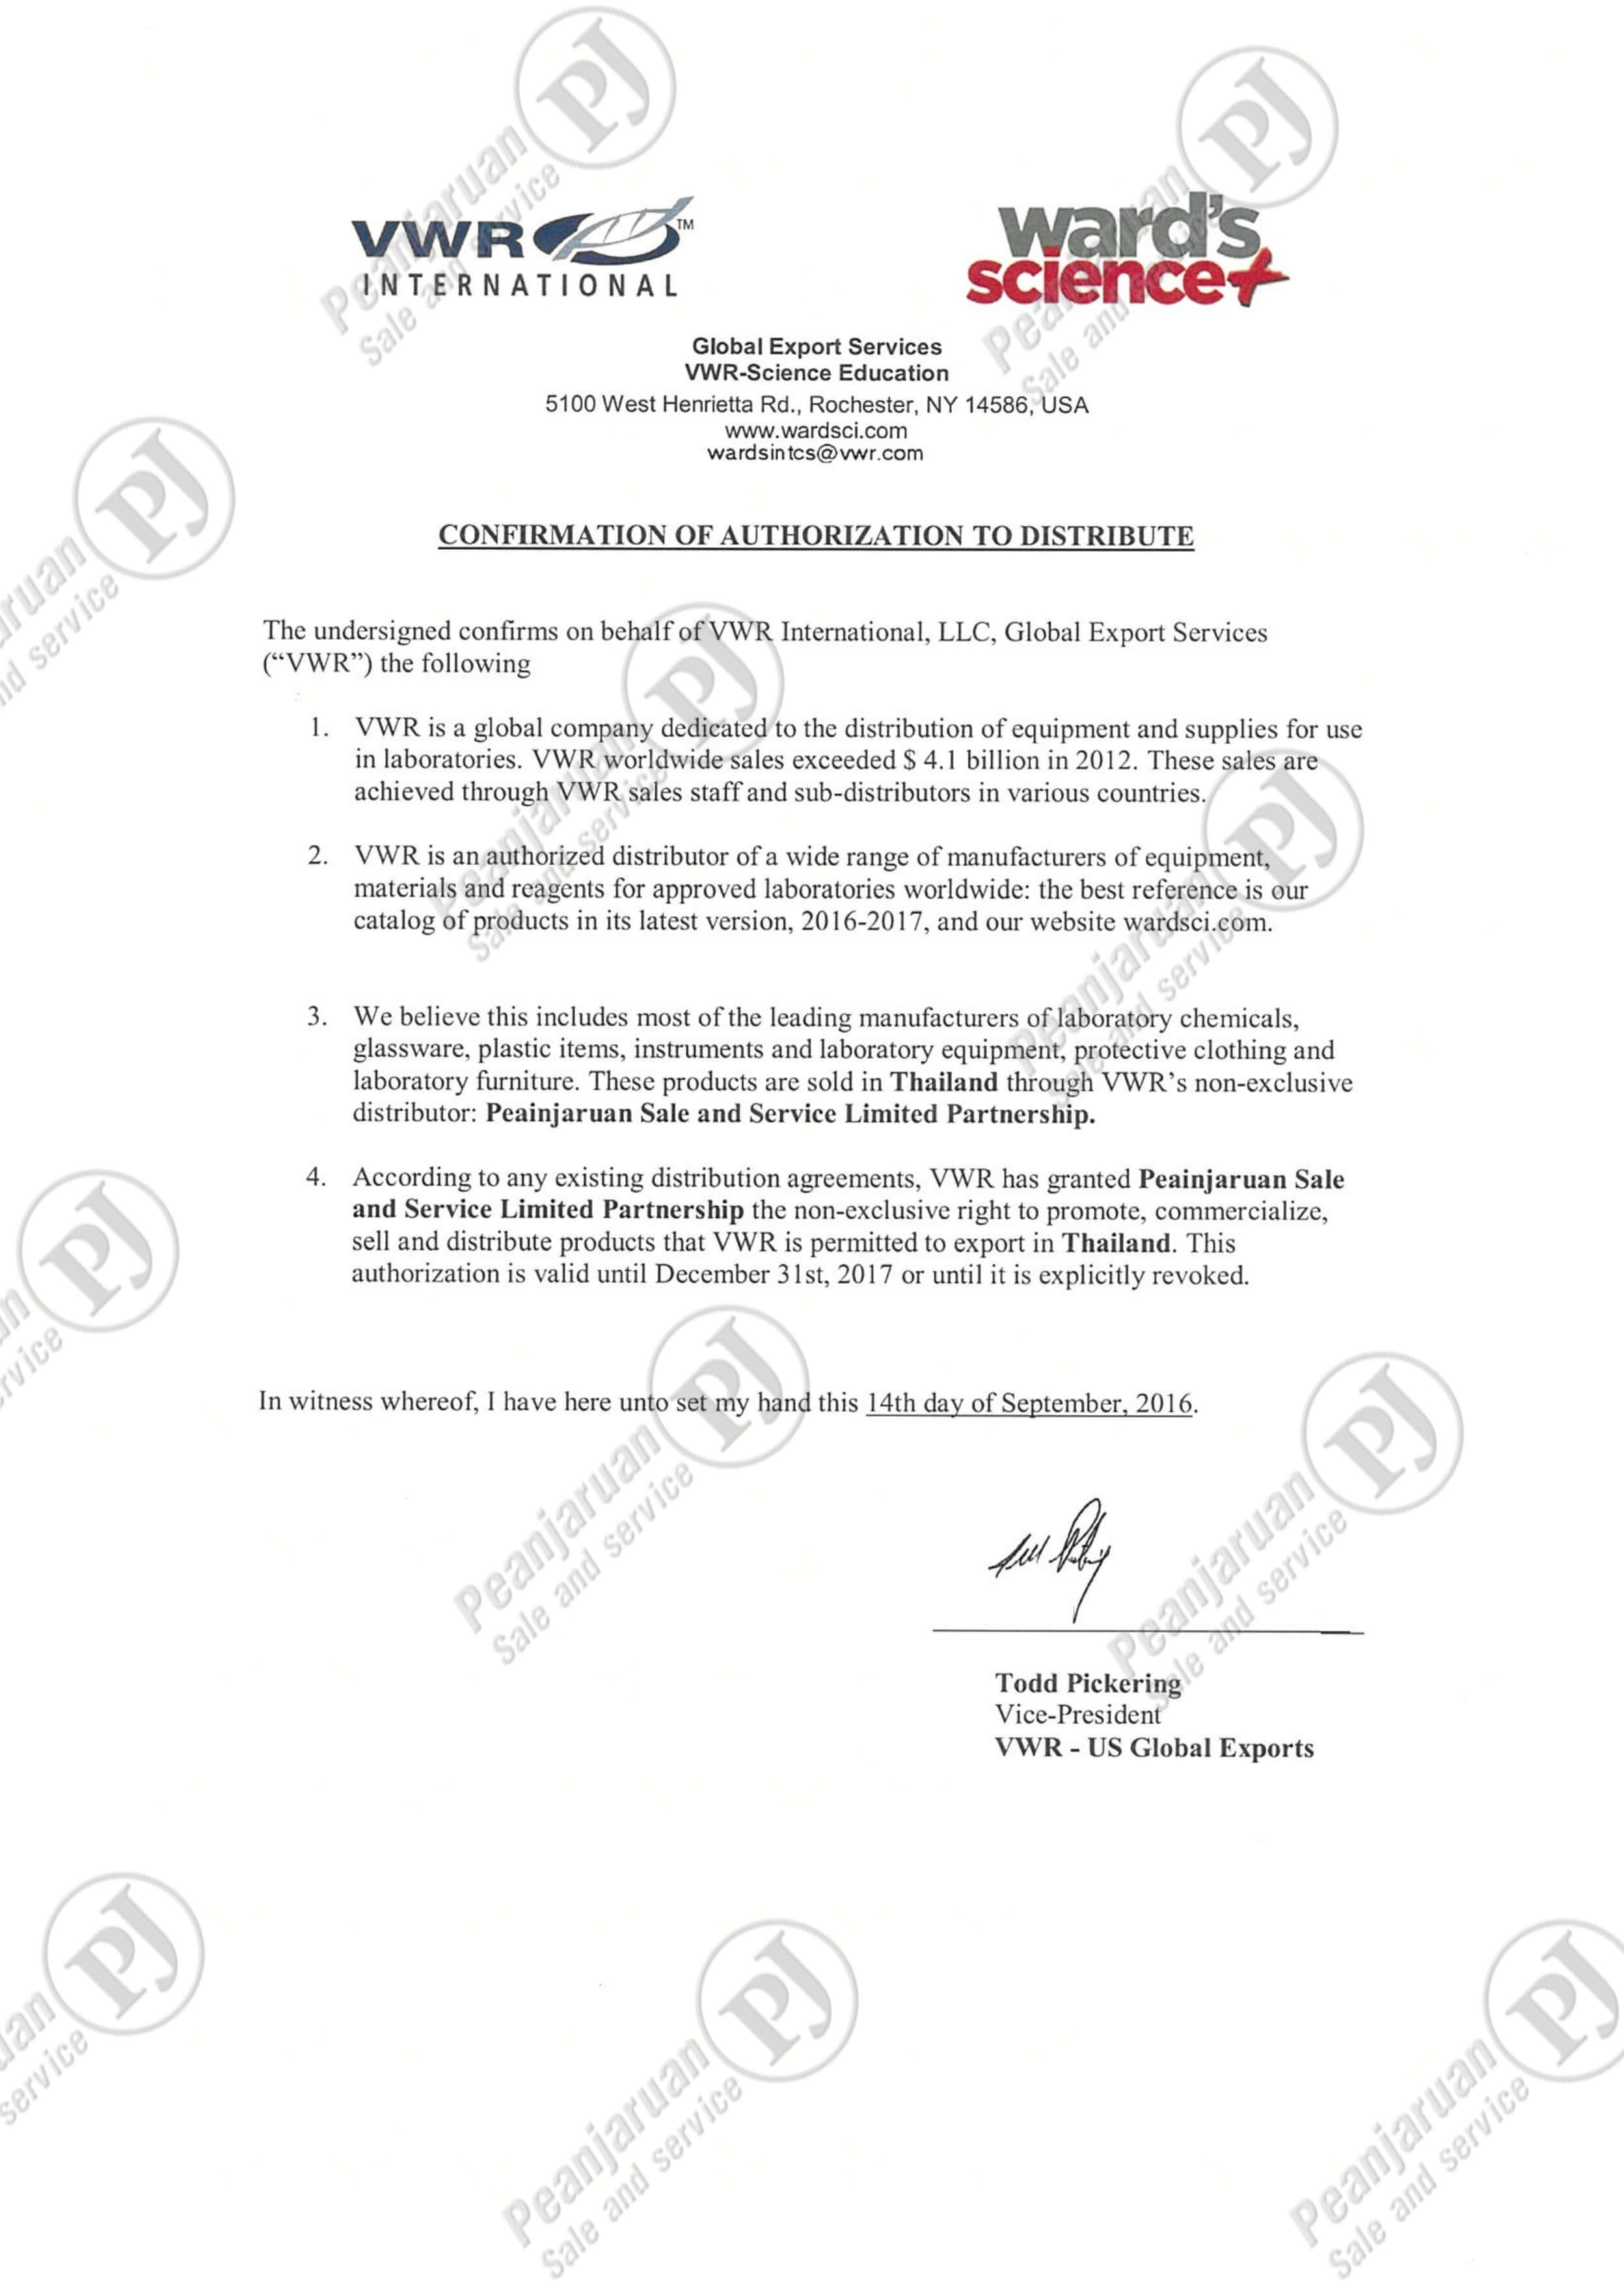 peanjaruan-authorization-11